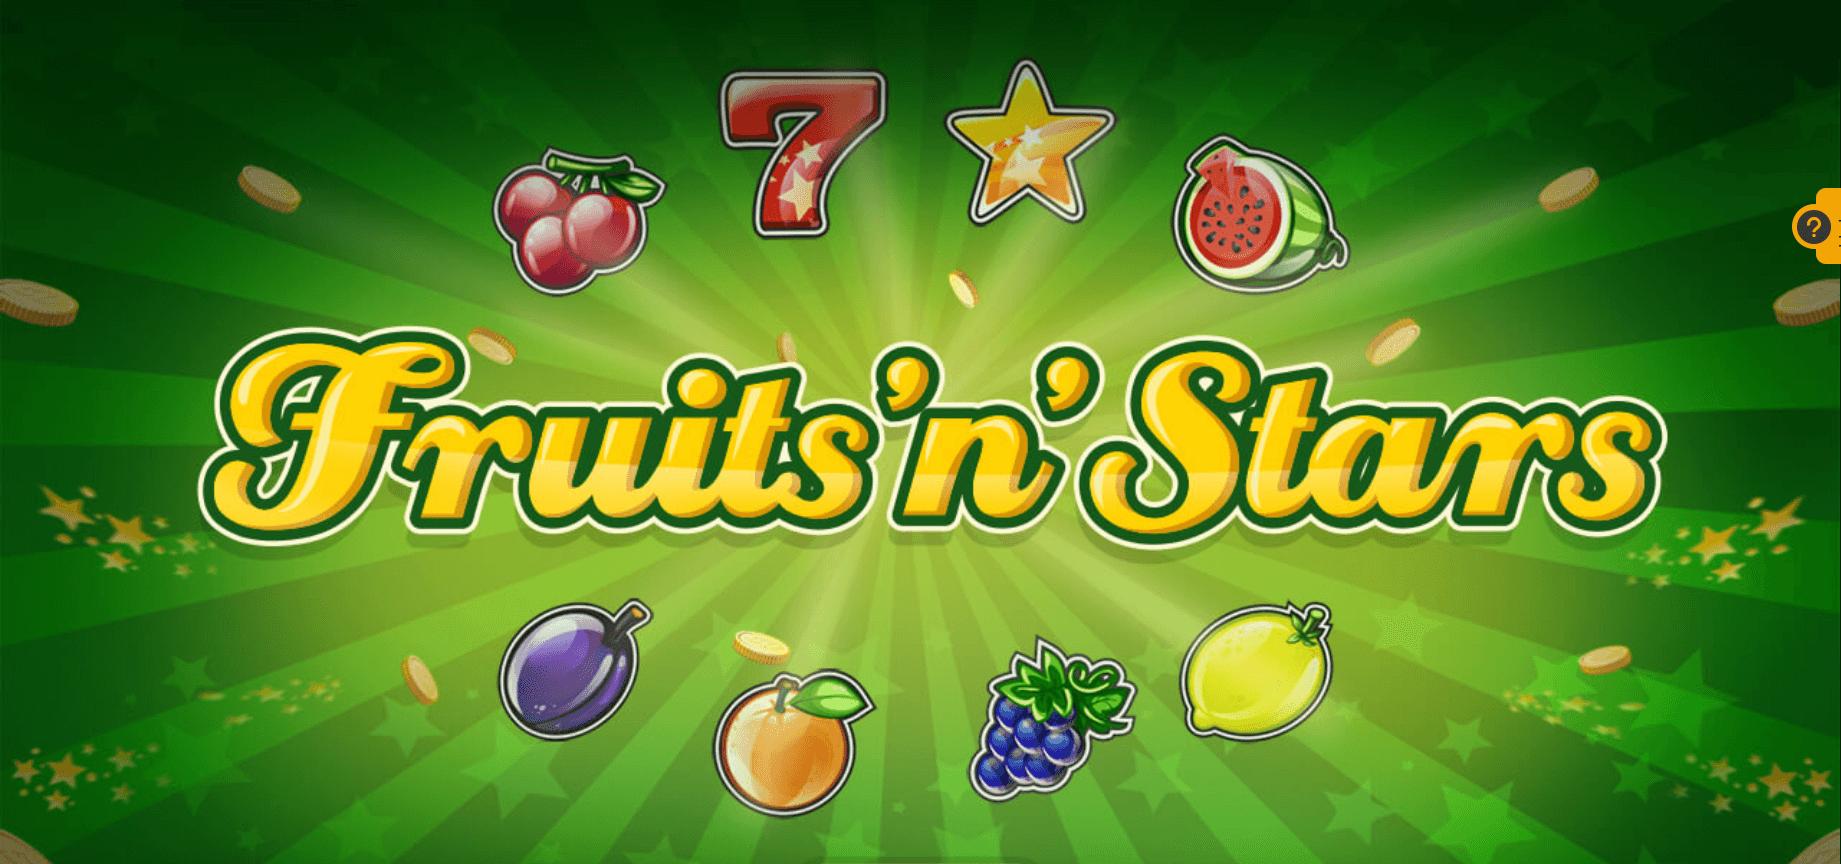 Fruits'n'stars slot